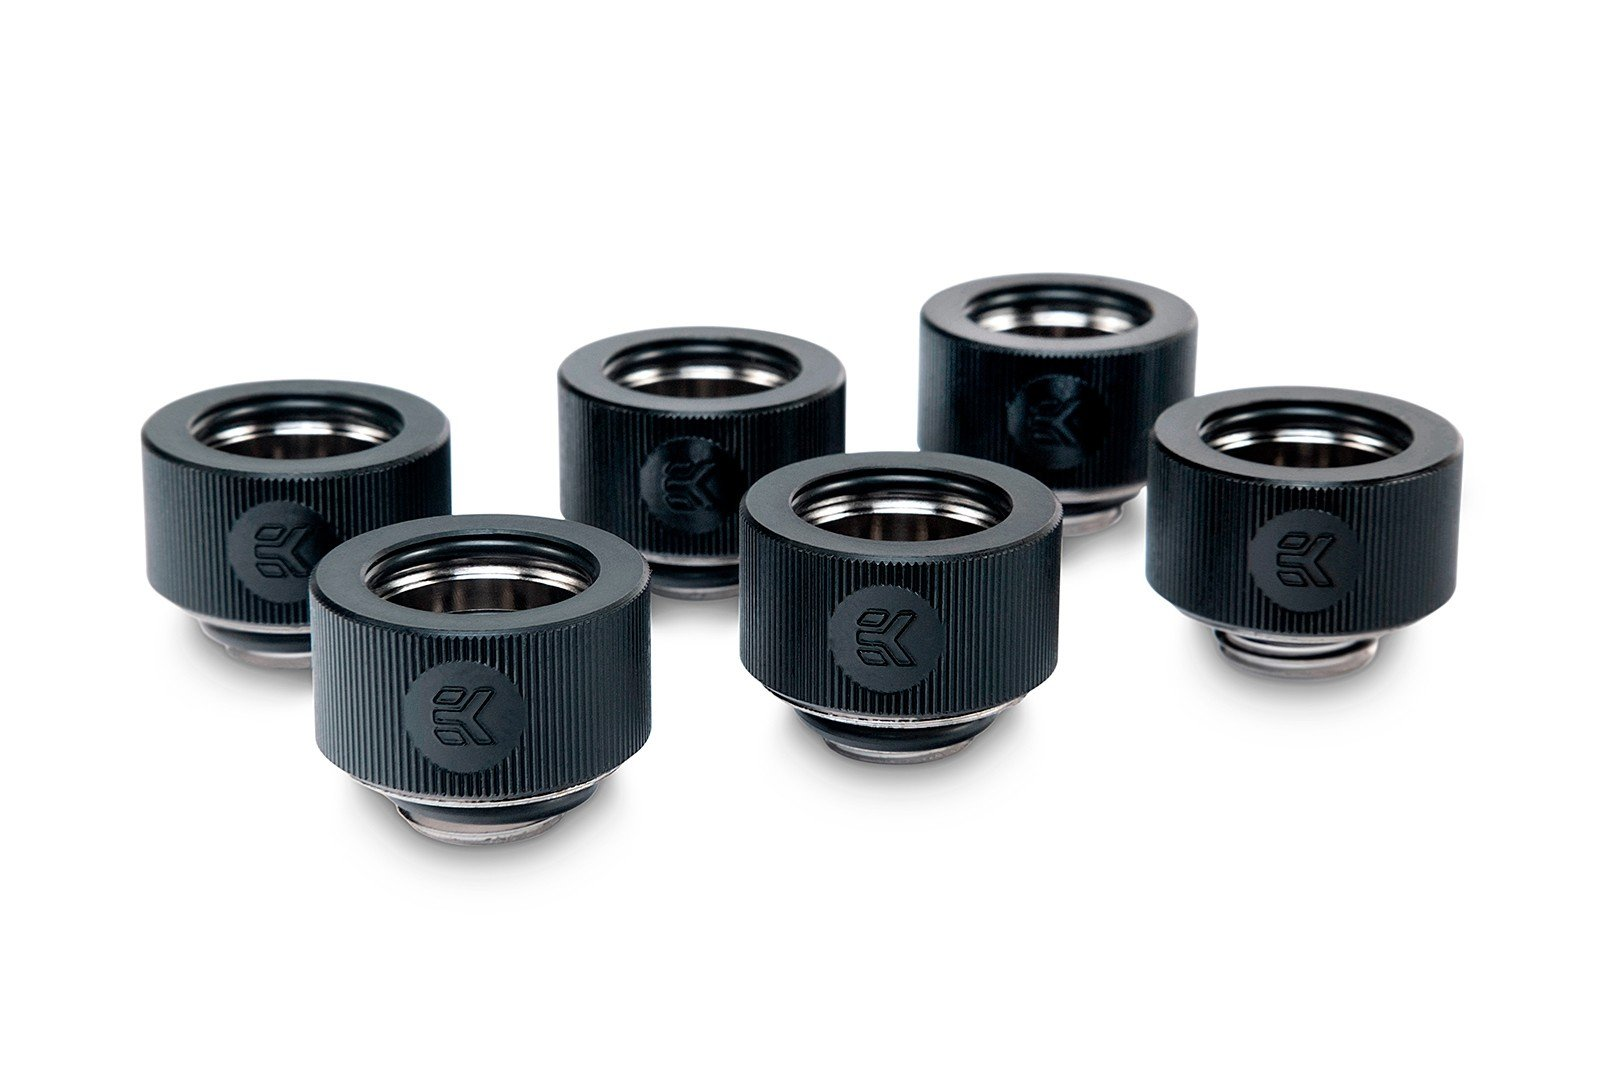 EKWB EK-HDC Compression Fitting for EK Rigid Tubing, 16mm OD, Black, 6-Pack